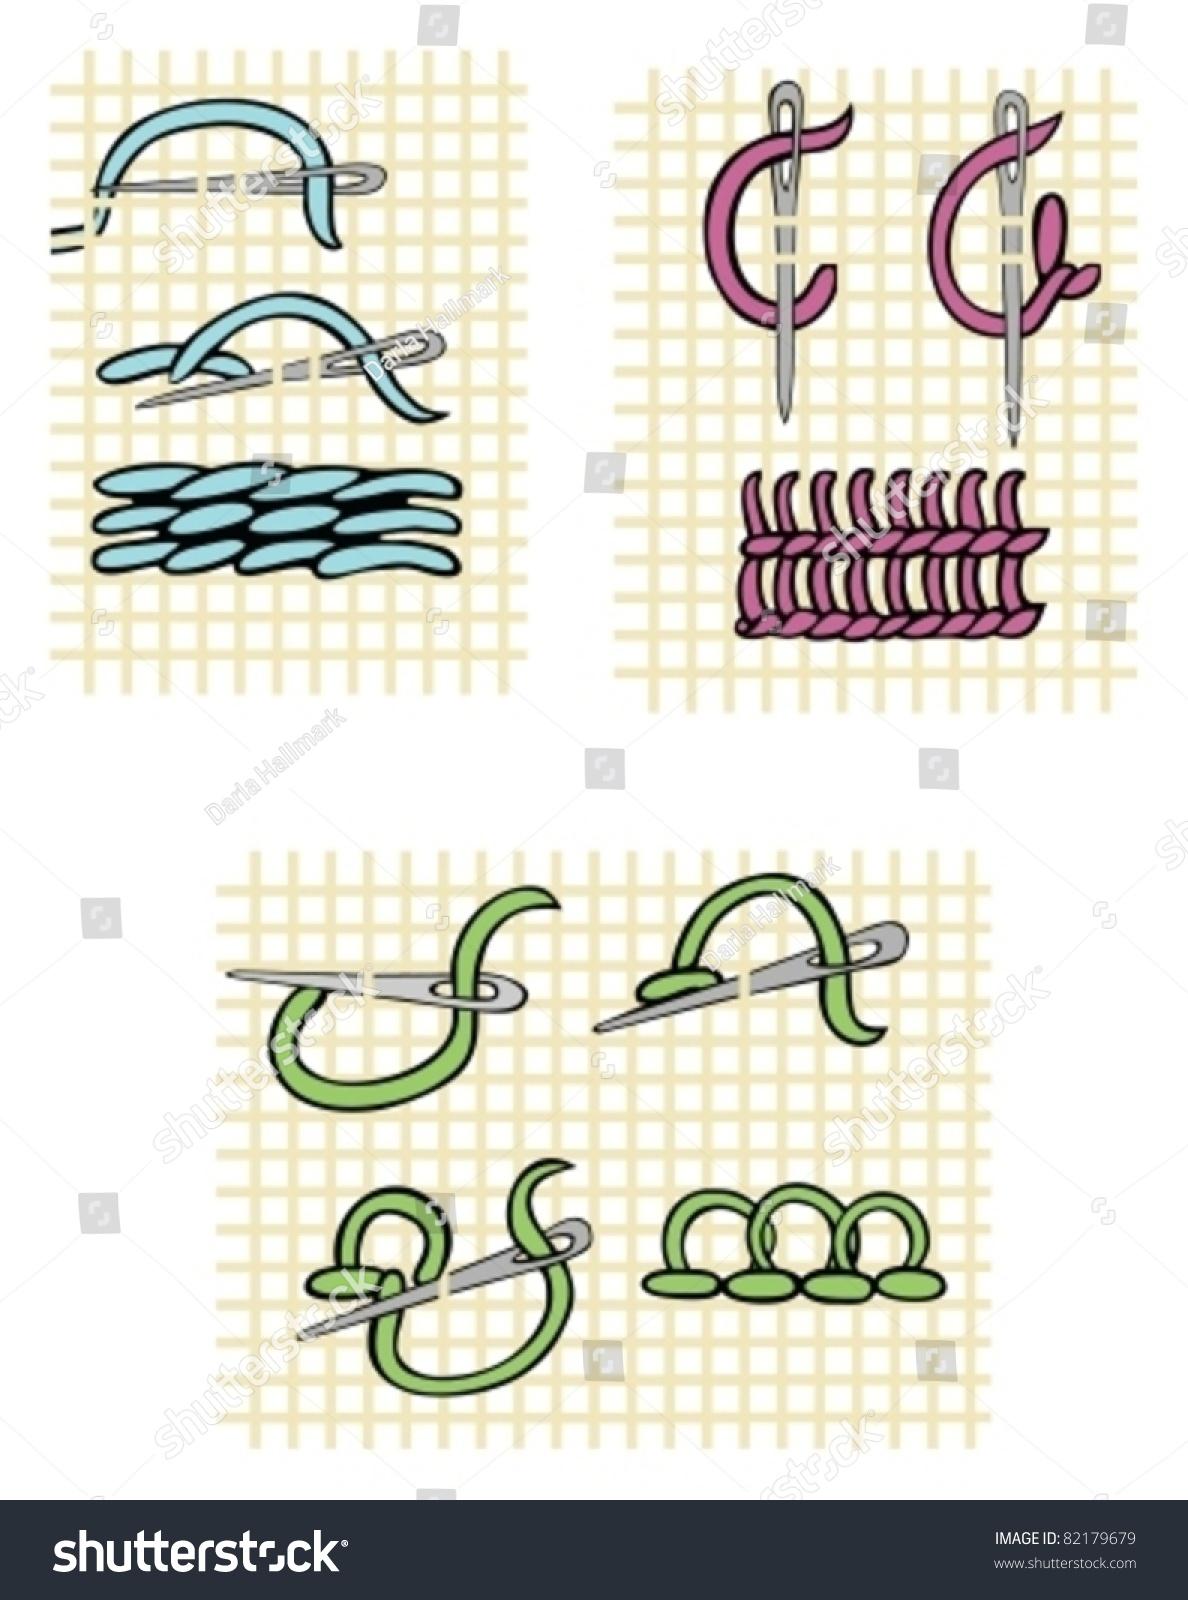 a-z embroidery stitches pdf